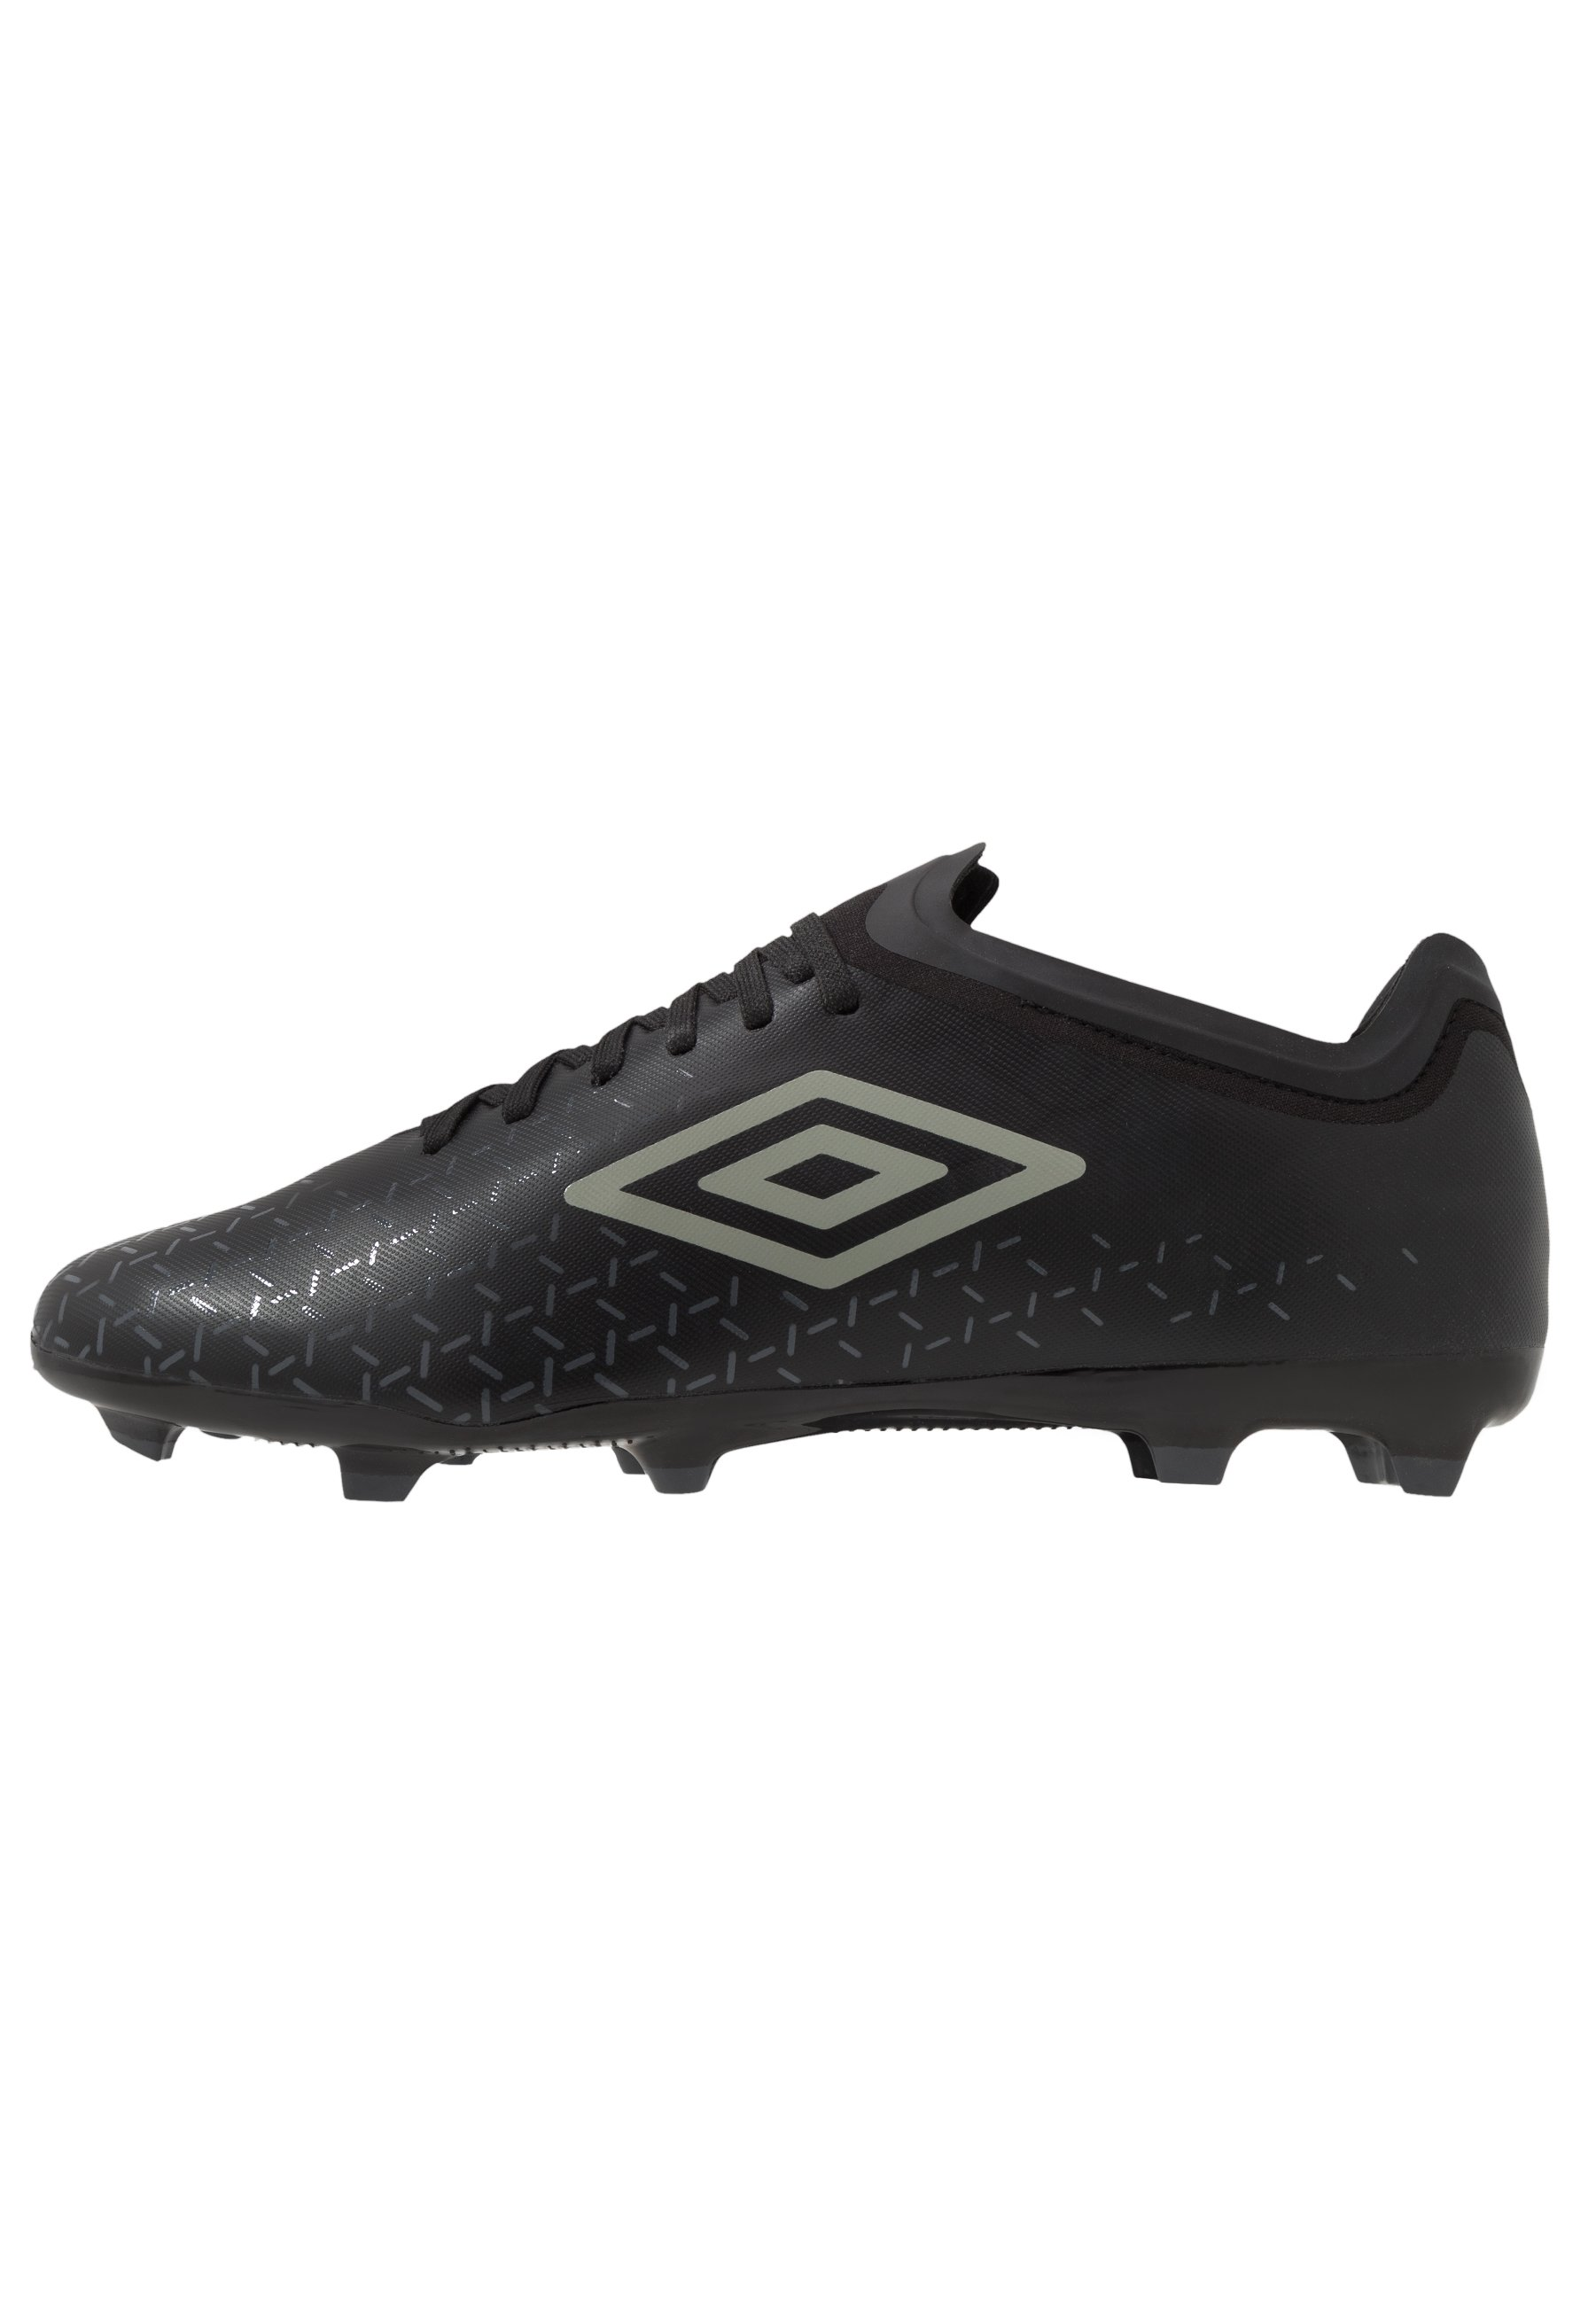 Umbro VELOCITA V PREMIER FG - Fotballsko - black/carbon